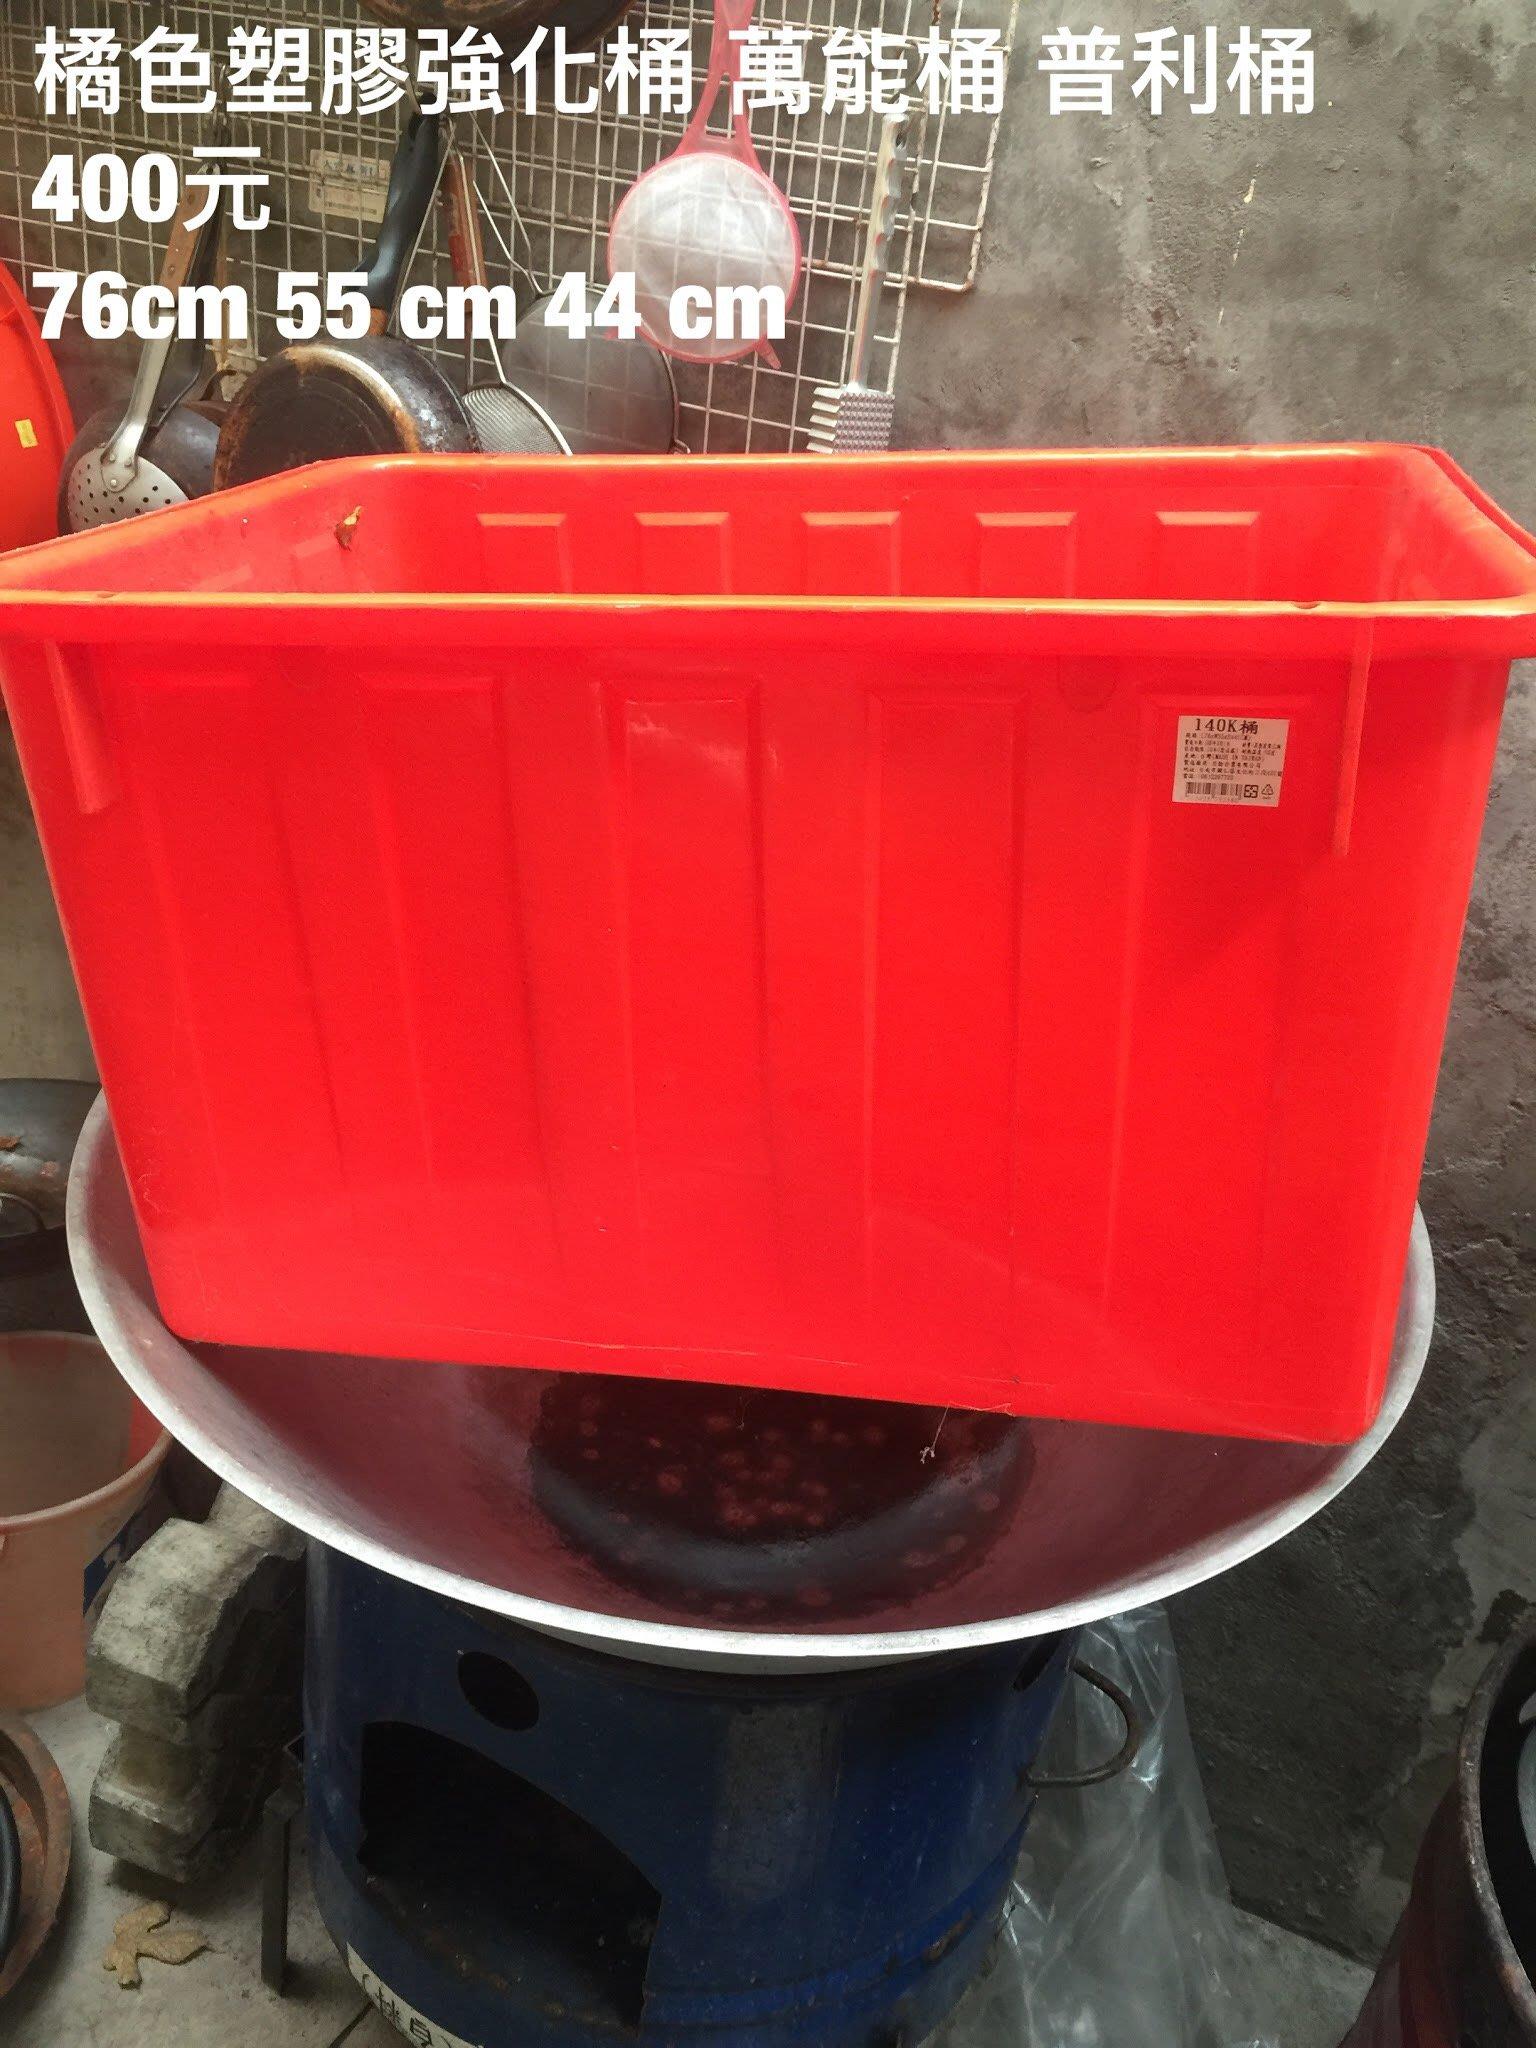 140k 塑膠桶 塑膠強化桶 普利桶 萬能桶 橘色 桶